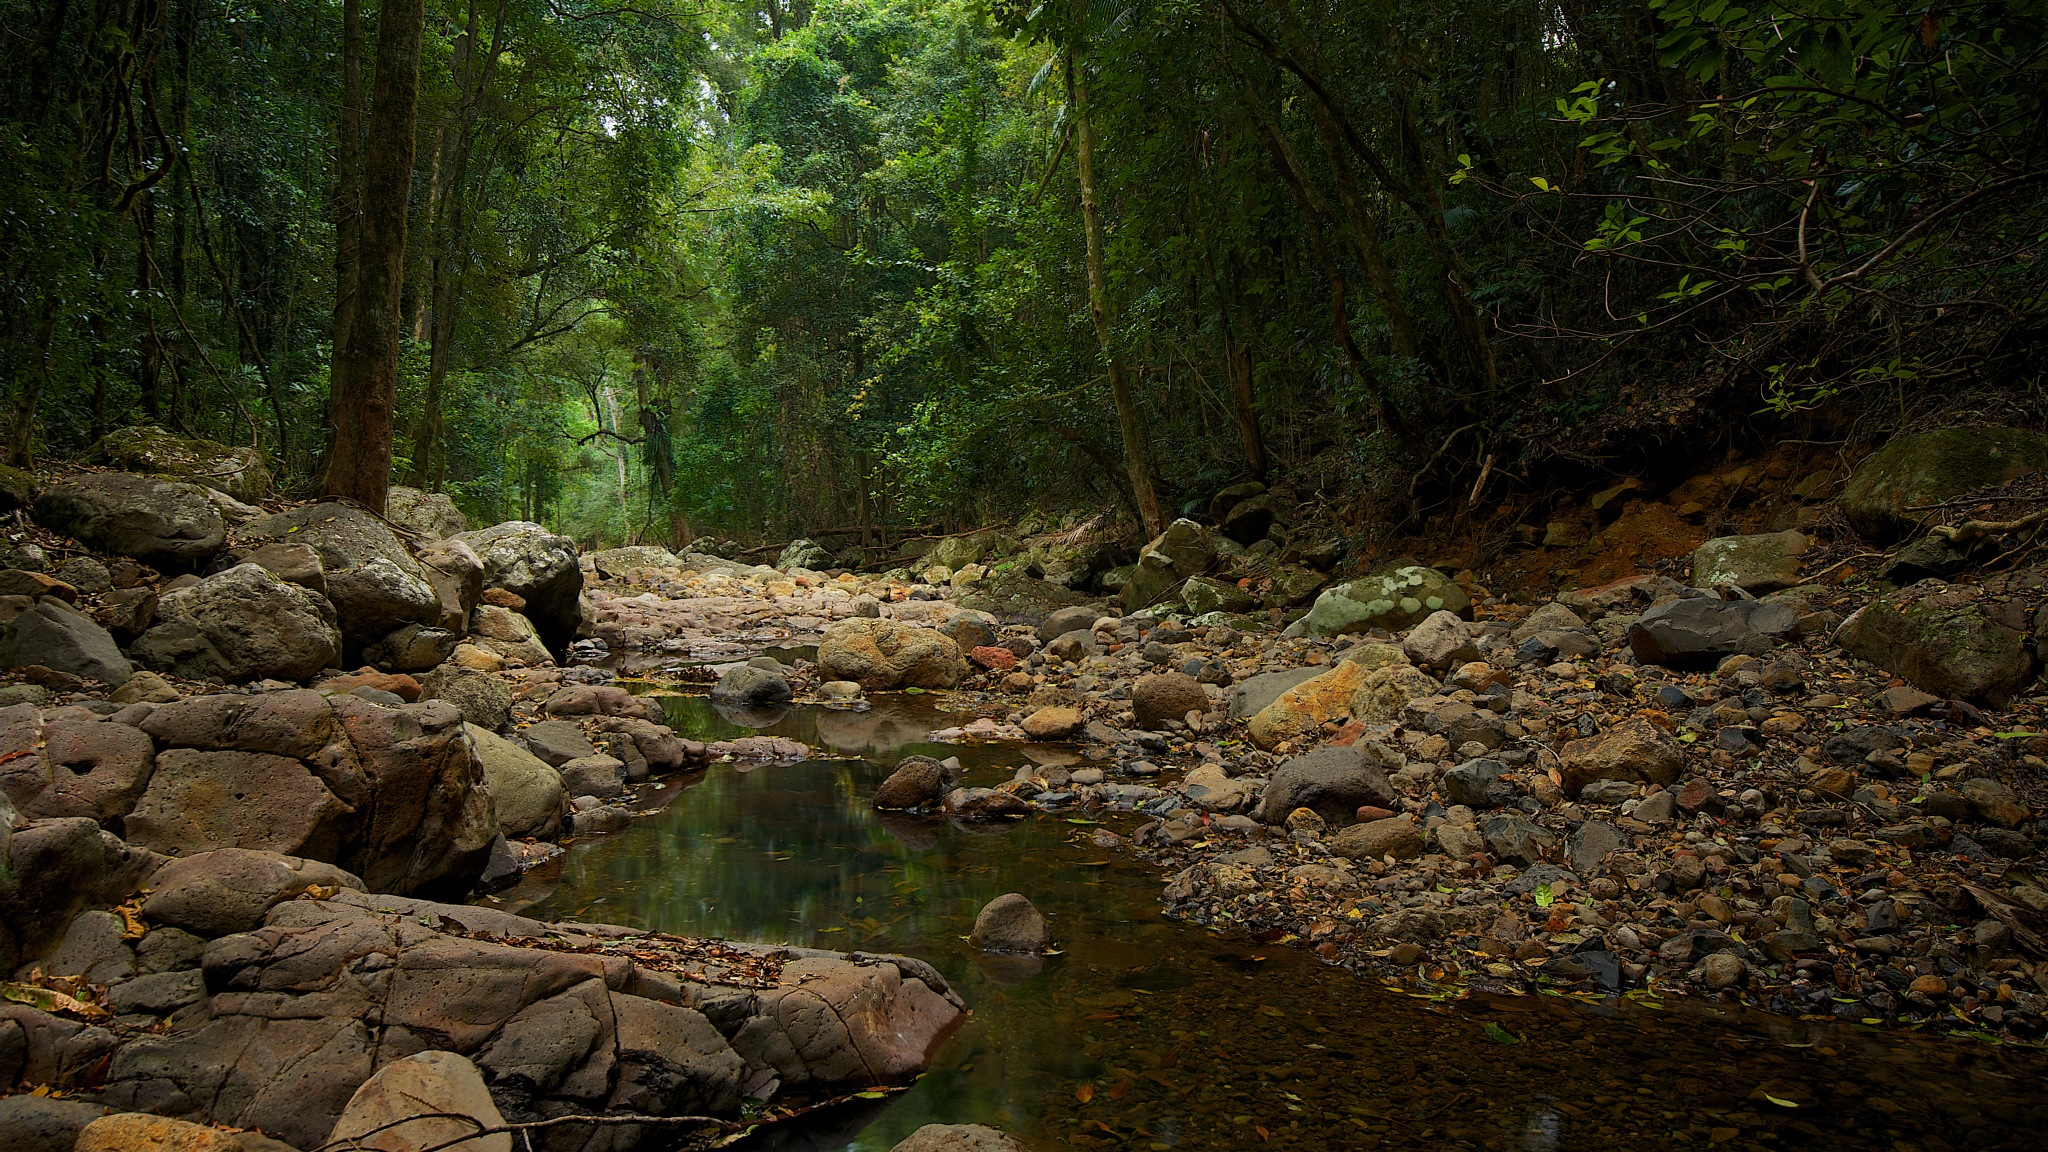 Springbrook rainforest by EmanuelPapamanolis